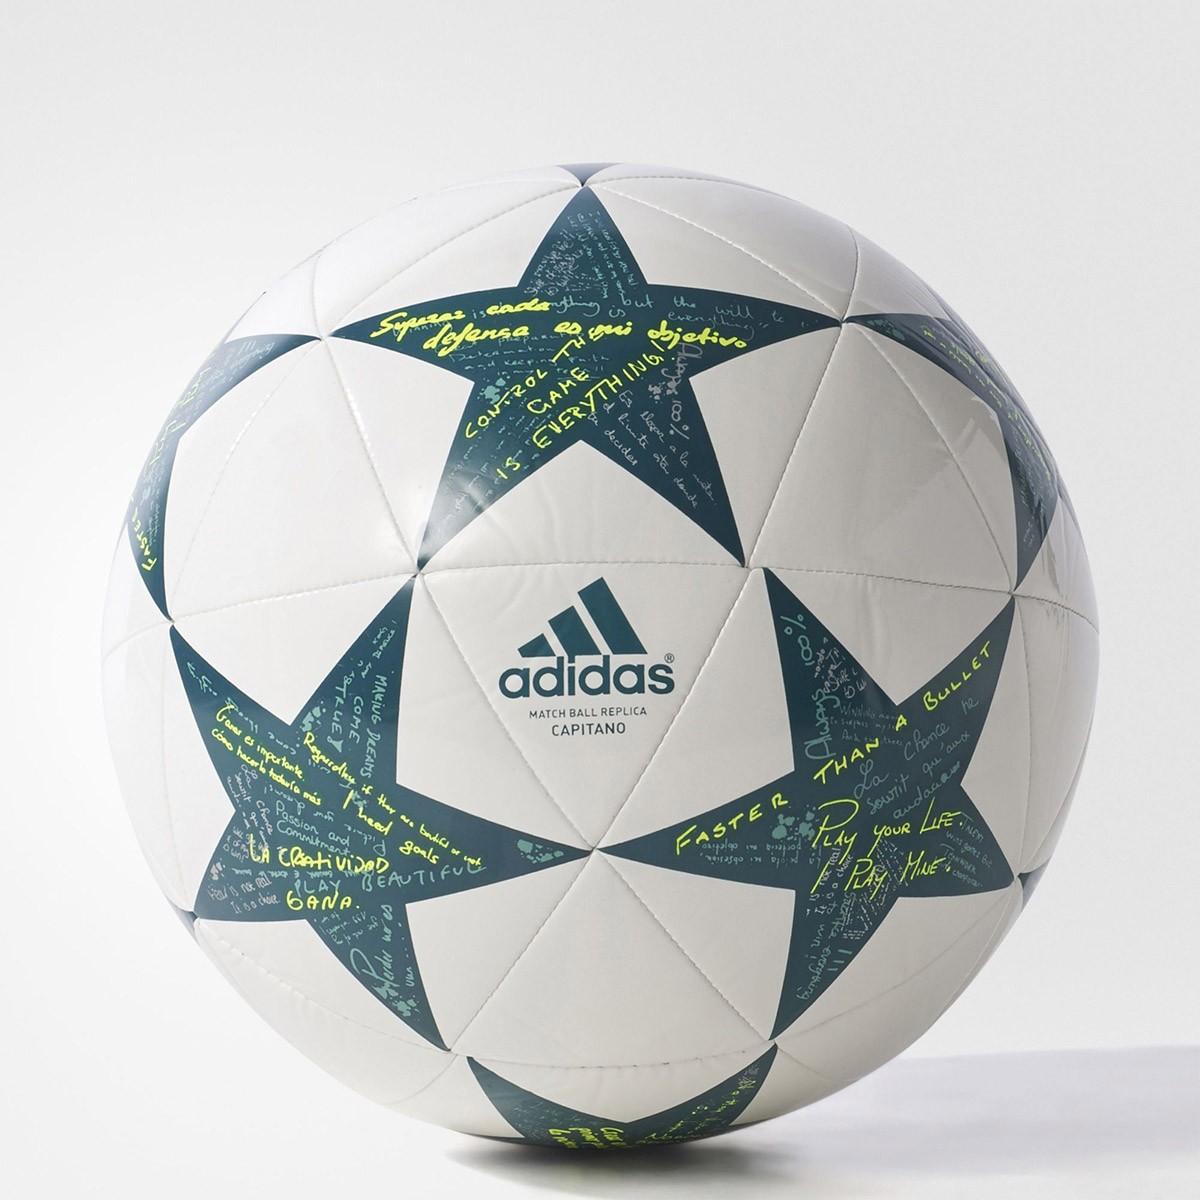 c60ed7f33a Bolas Adidas Final Champions League